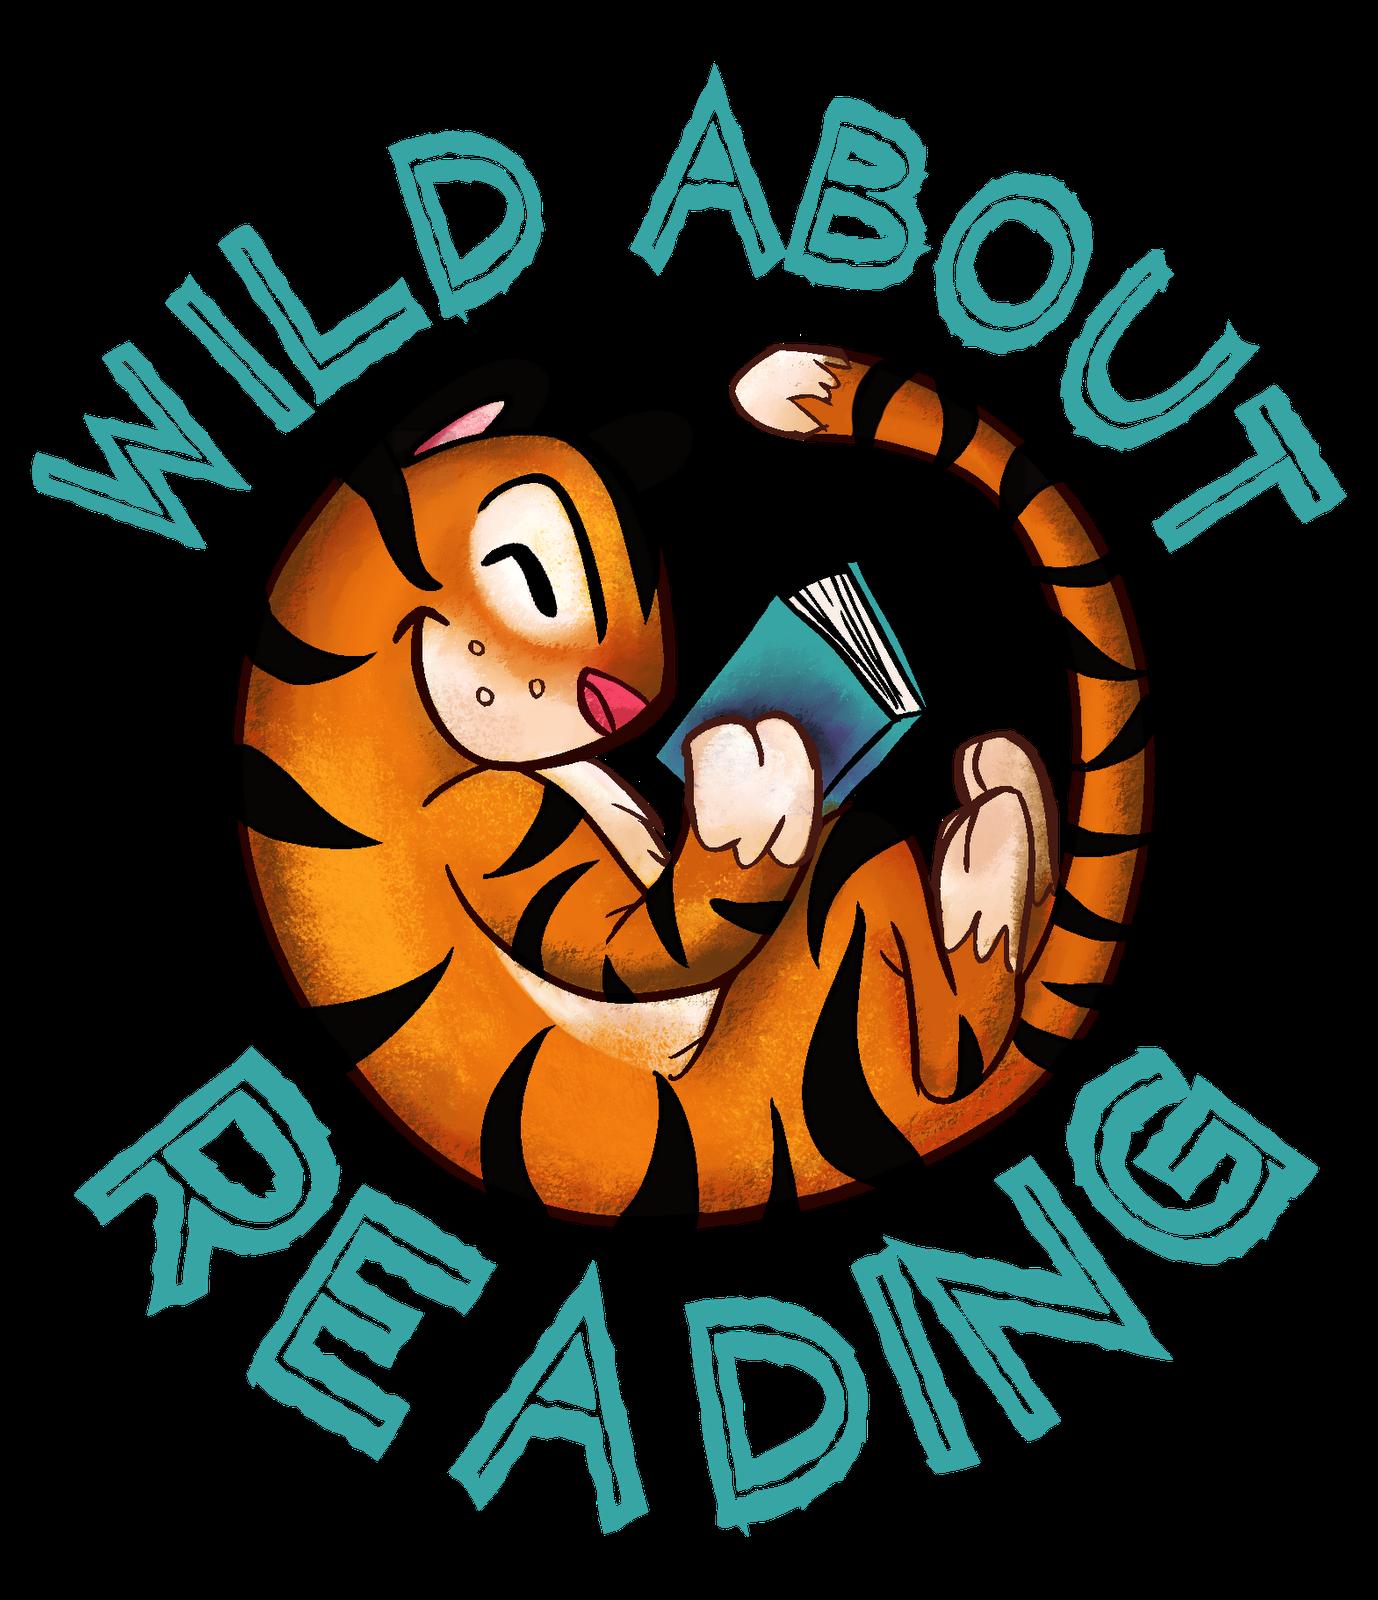 Clipart reading children\'s book, Clipart reading children\'s.